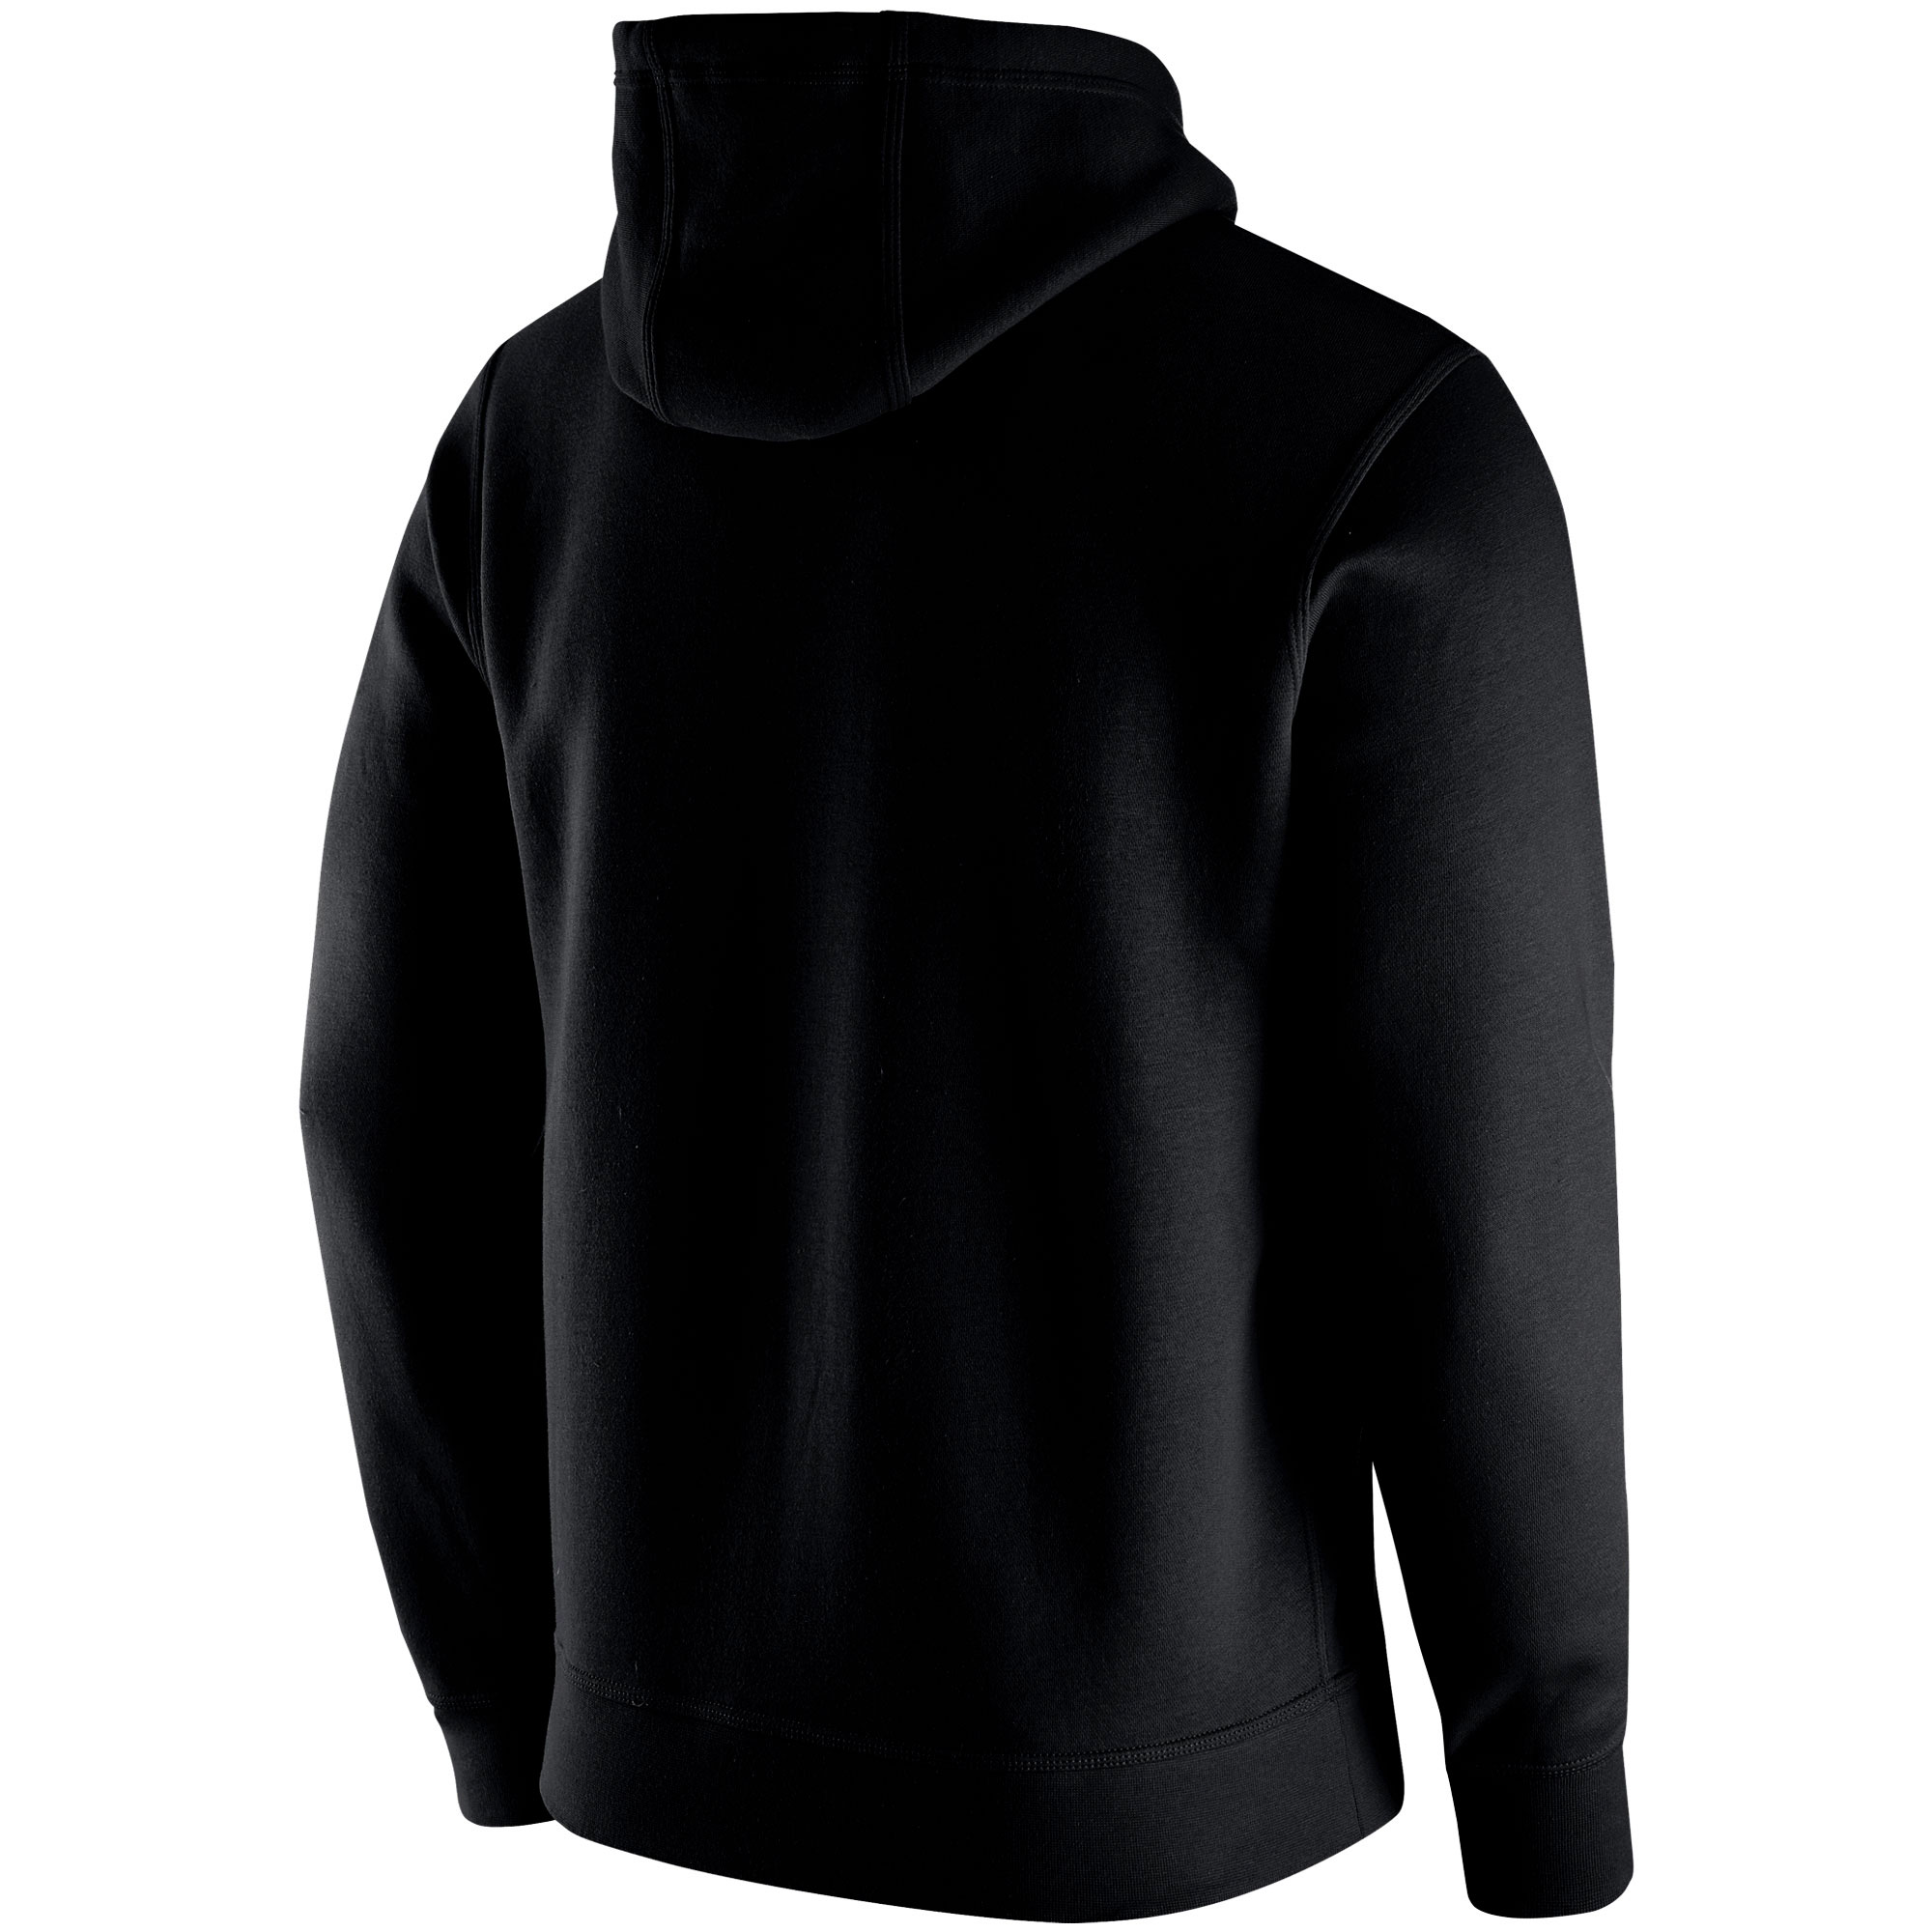 New Orleans Saints Nike Fan Gear Club Throwback Pullover Hoodie - Black -  Walmart.com bb22a3af1